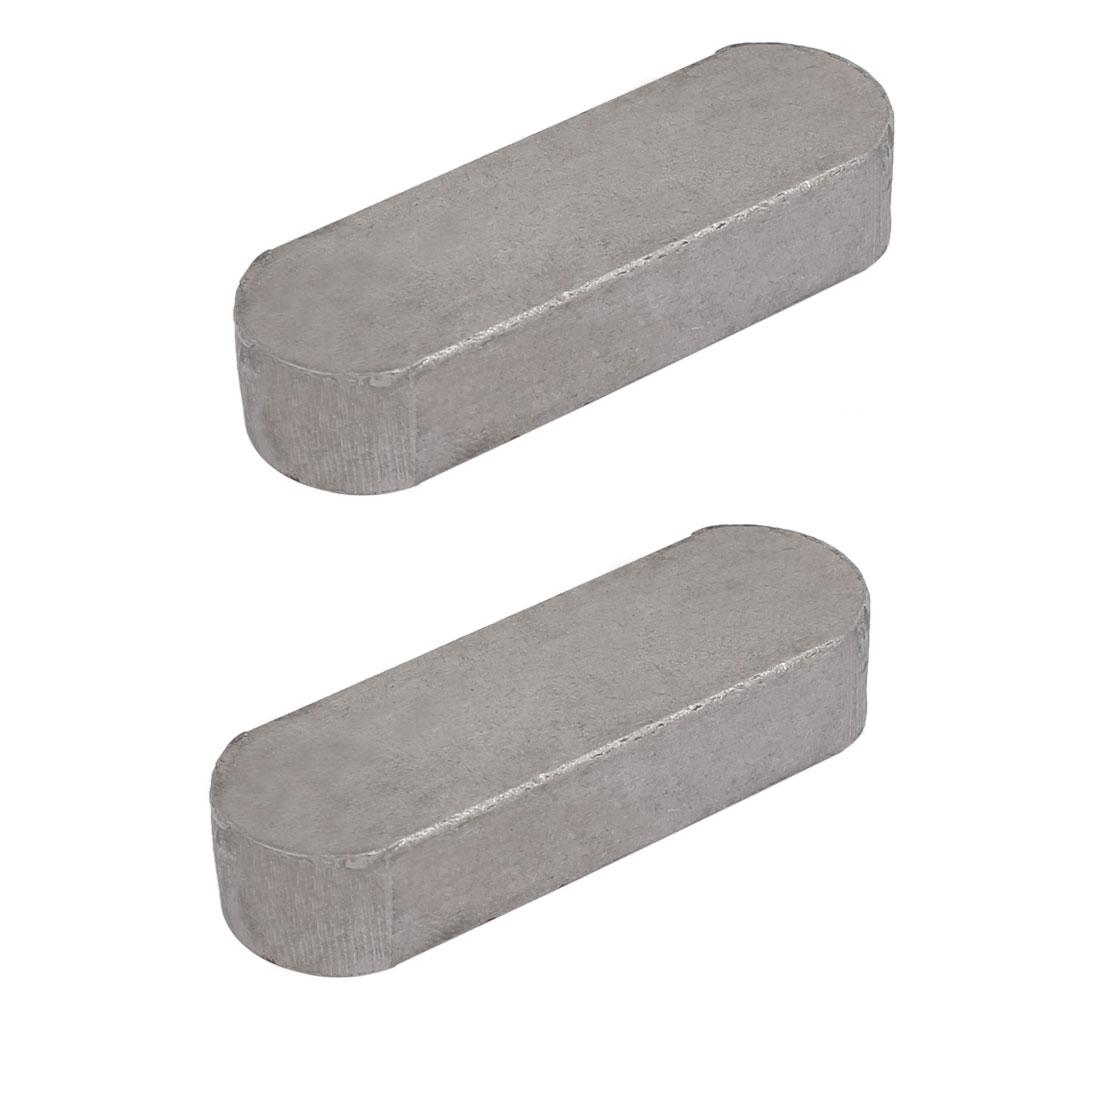 55mmx18mmx11mm Carbon Steel Key Stock To Lock Pulleys 2pcs